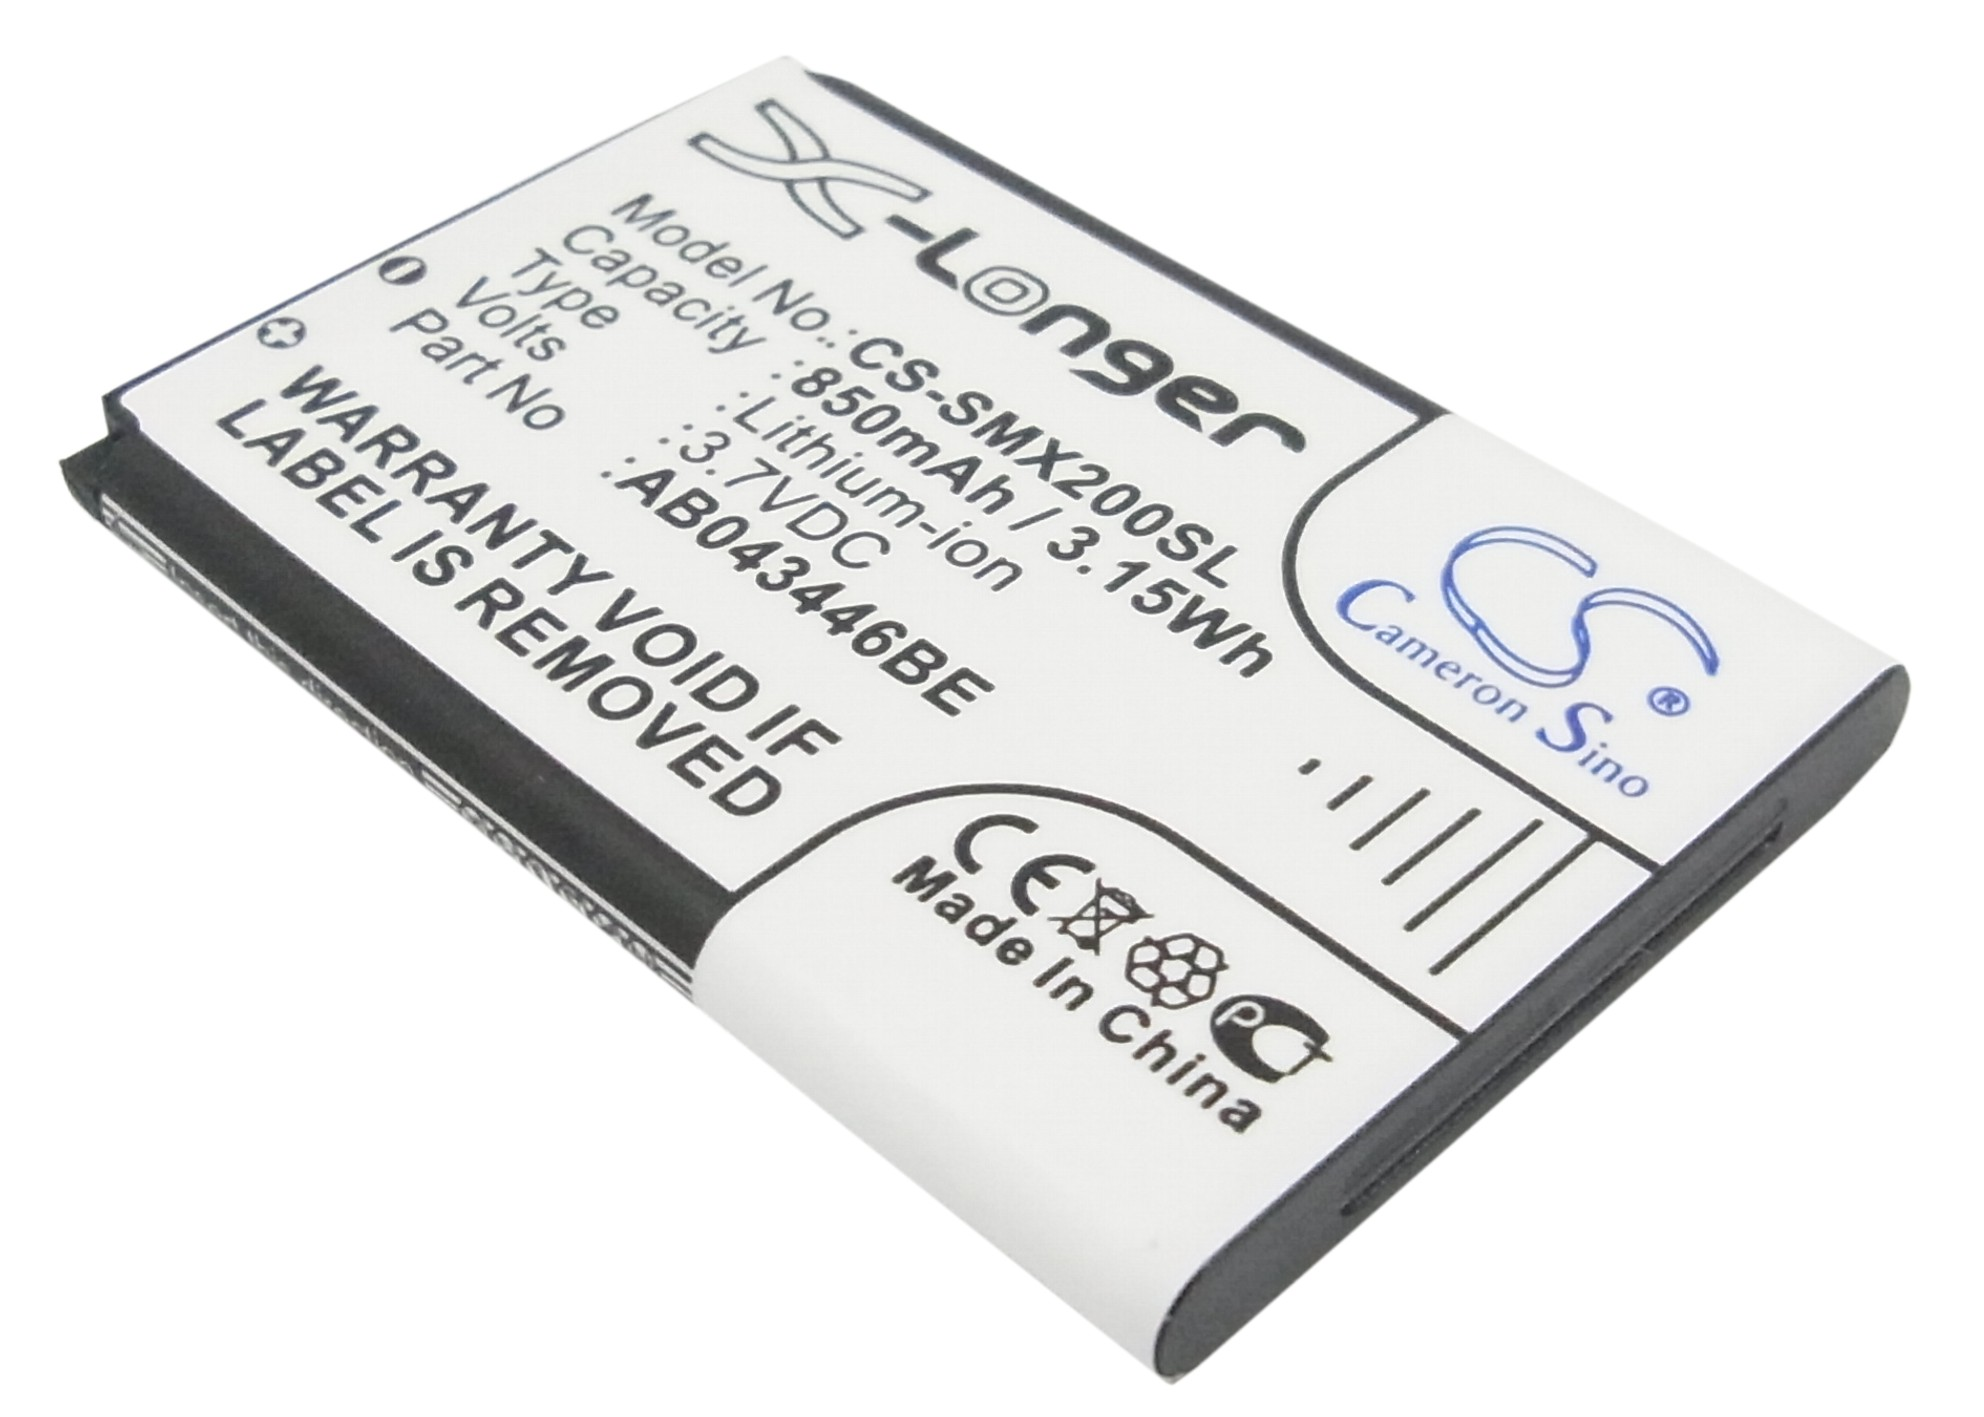 Cameron Sino baterie do mobilů pro SAMSUNG GT-E2120 3.7V Li-ion 850mAh černá - neoriginální